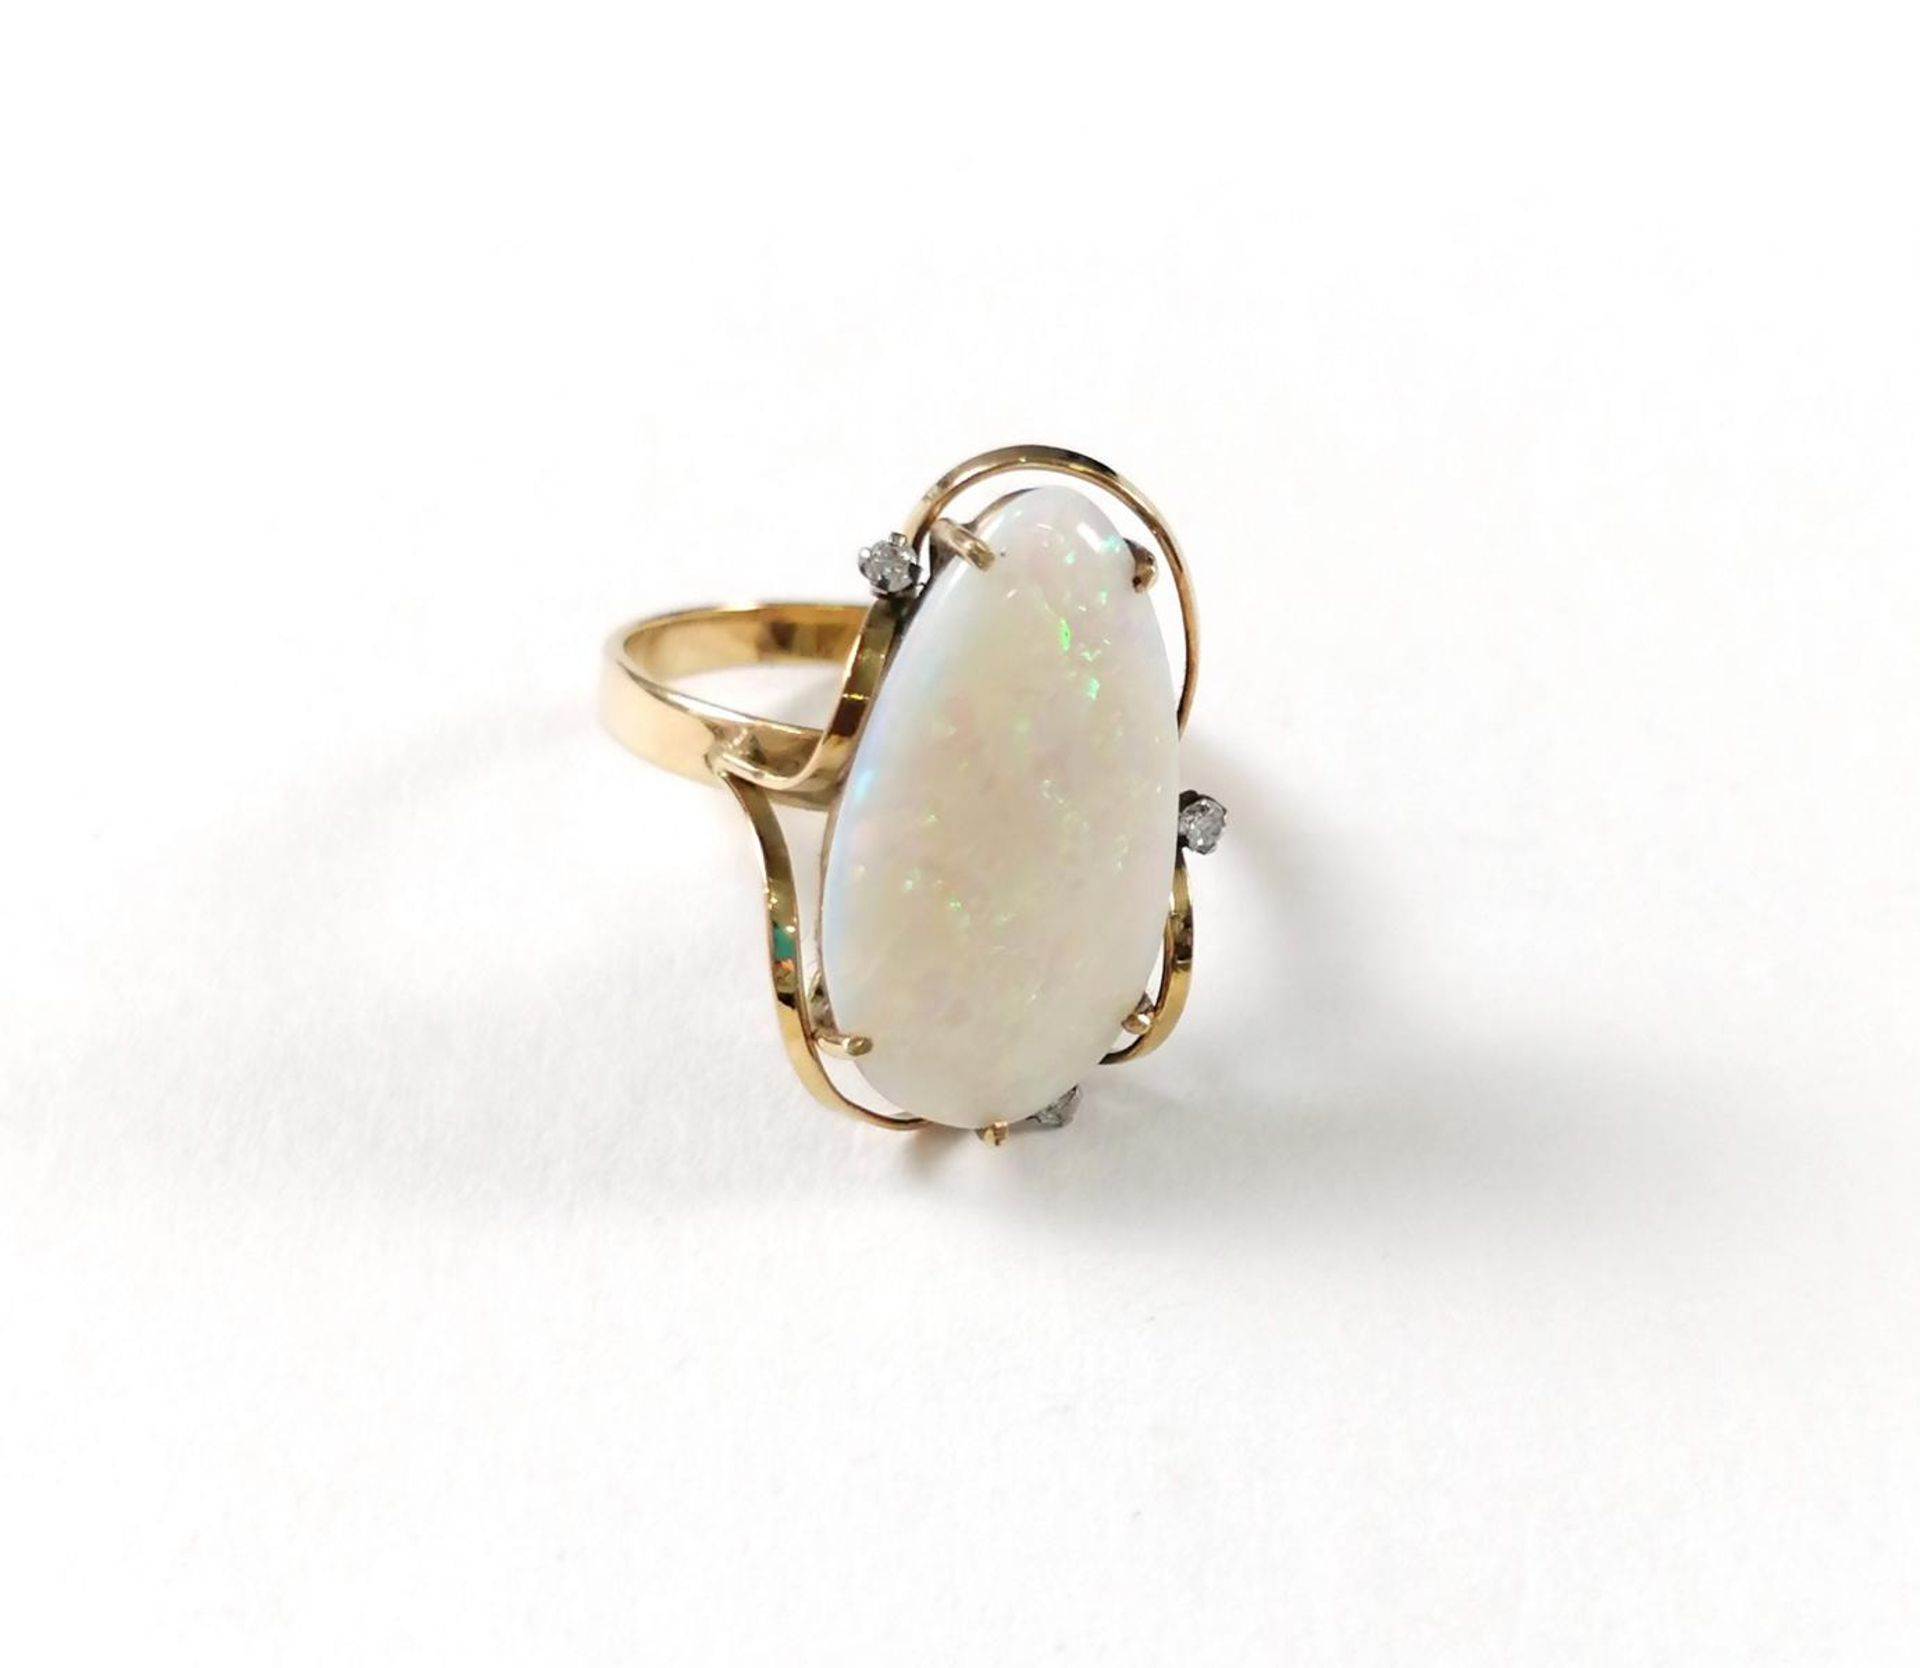 Gelbgold-Opalring mit Diamanten - Image 2 of 5